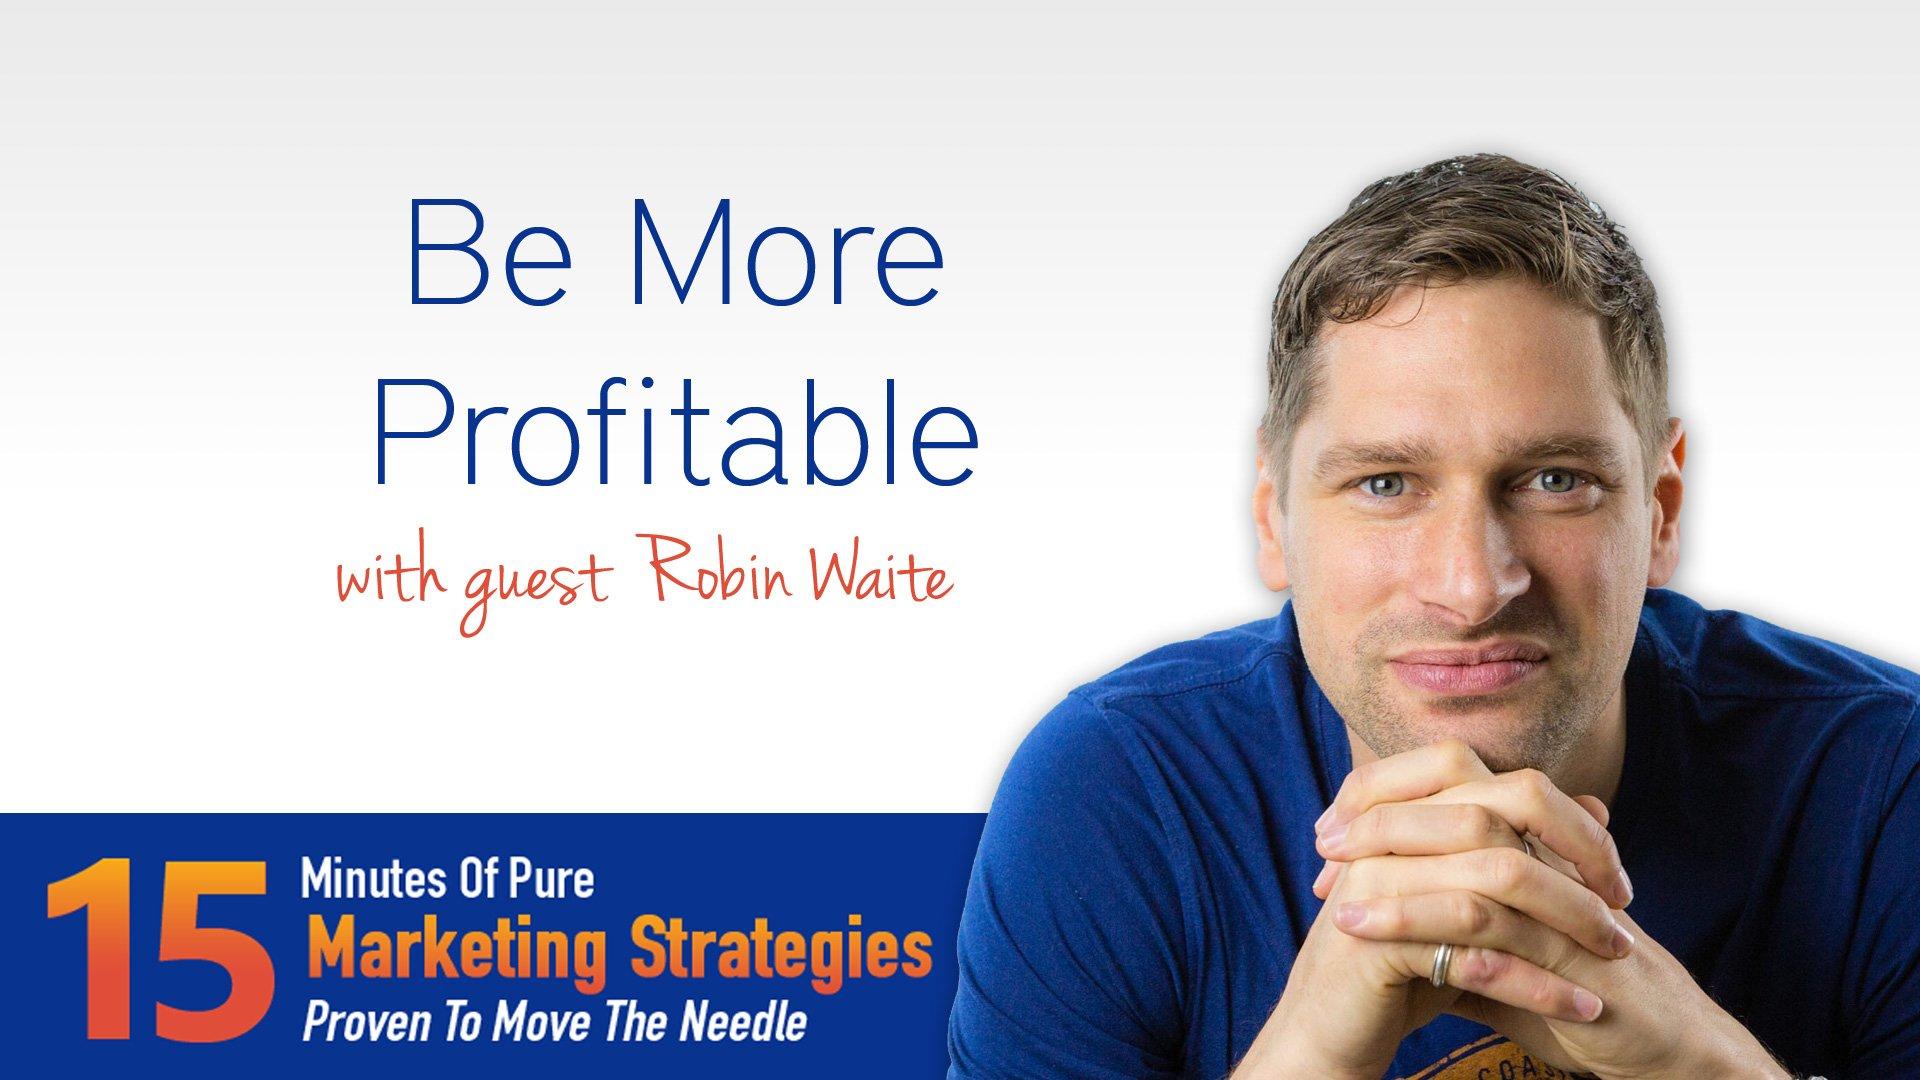 Be More Profitable